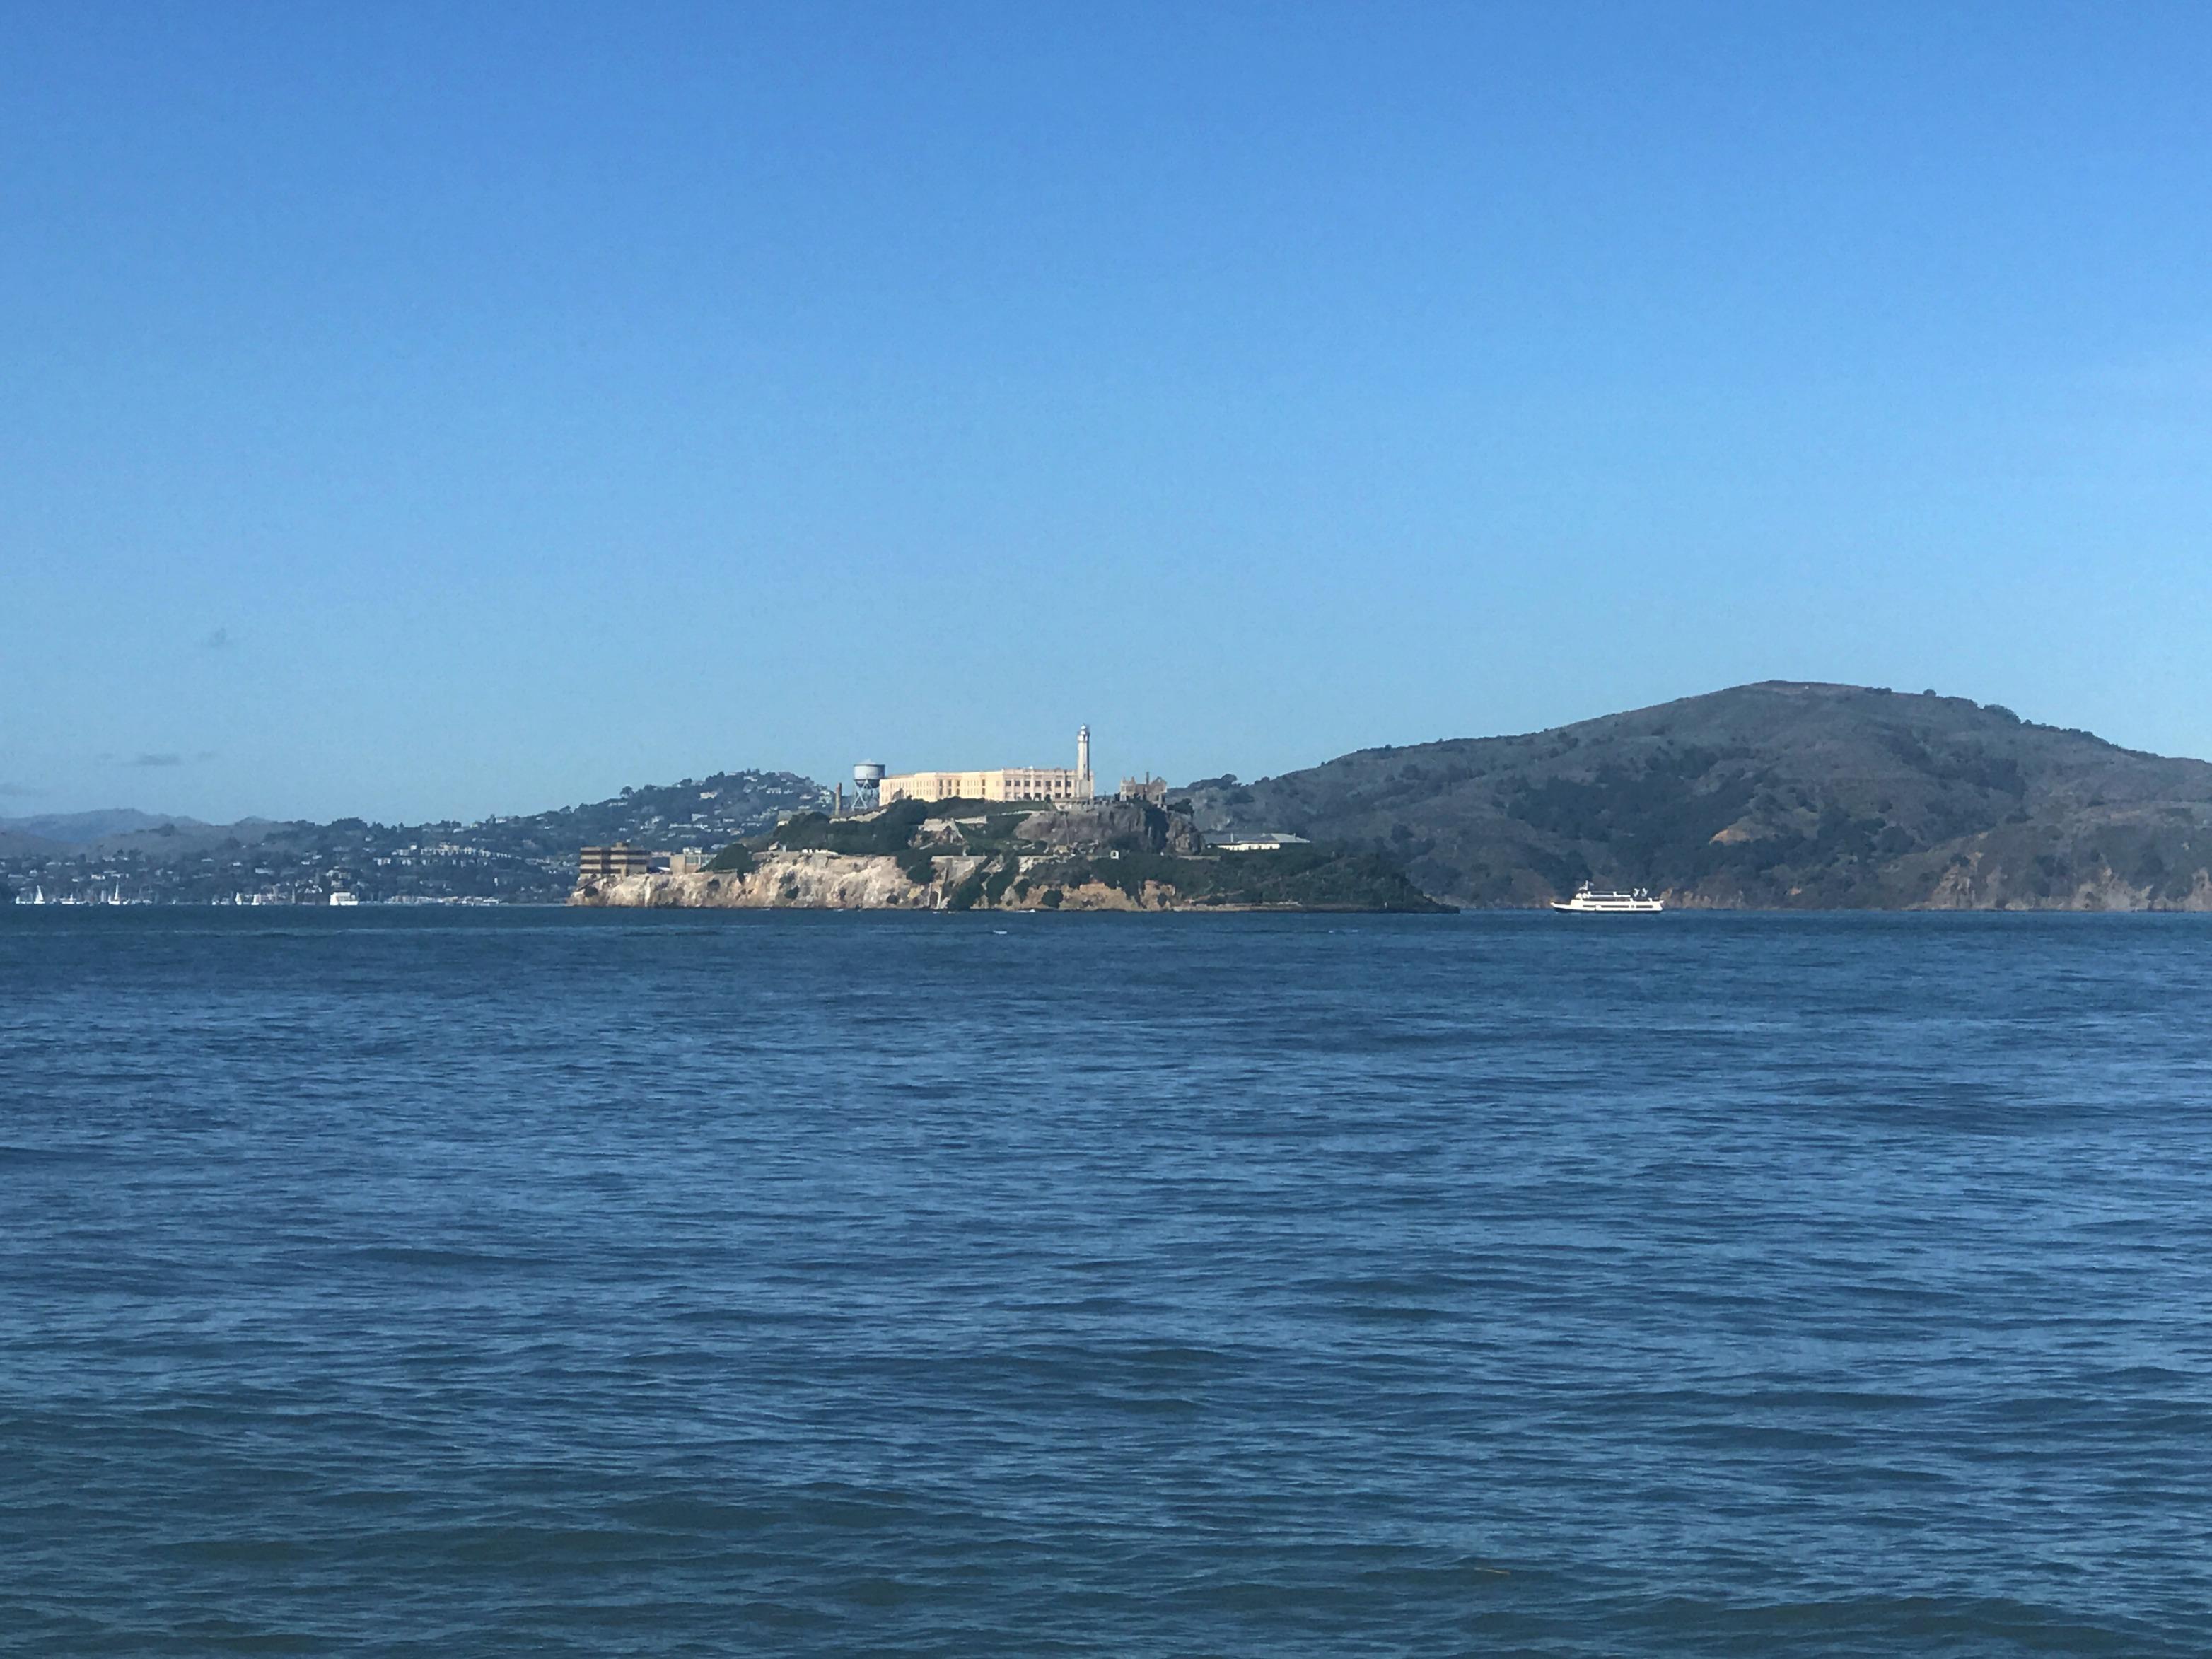 Visit alcatraz, Alcatraz tickets, Alcatraz San Francisco, Pier 39 San Francisco, Fisherman's Wharf, Explore San Francisco in One Day